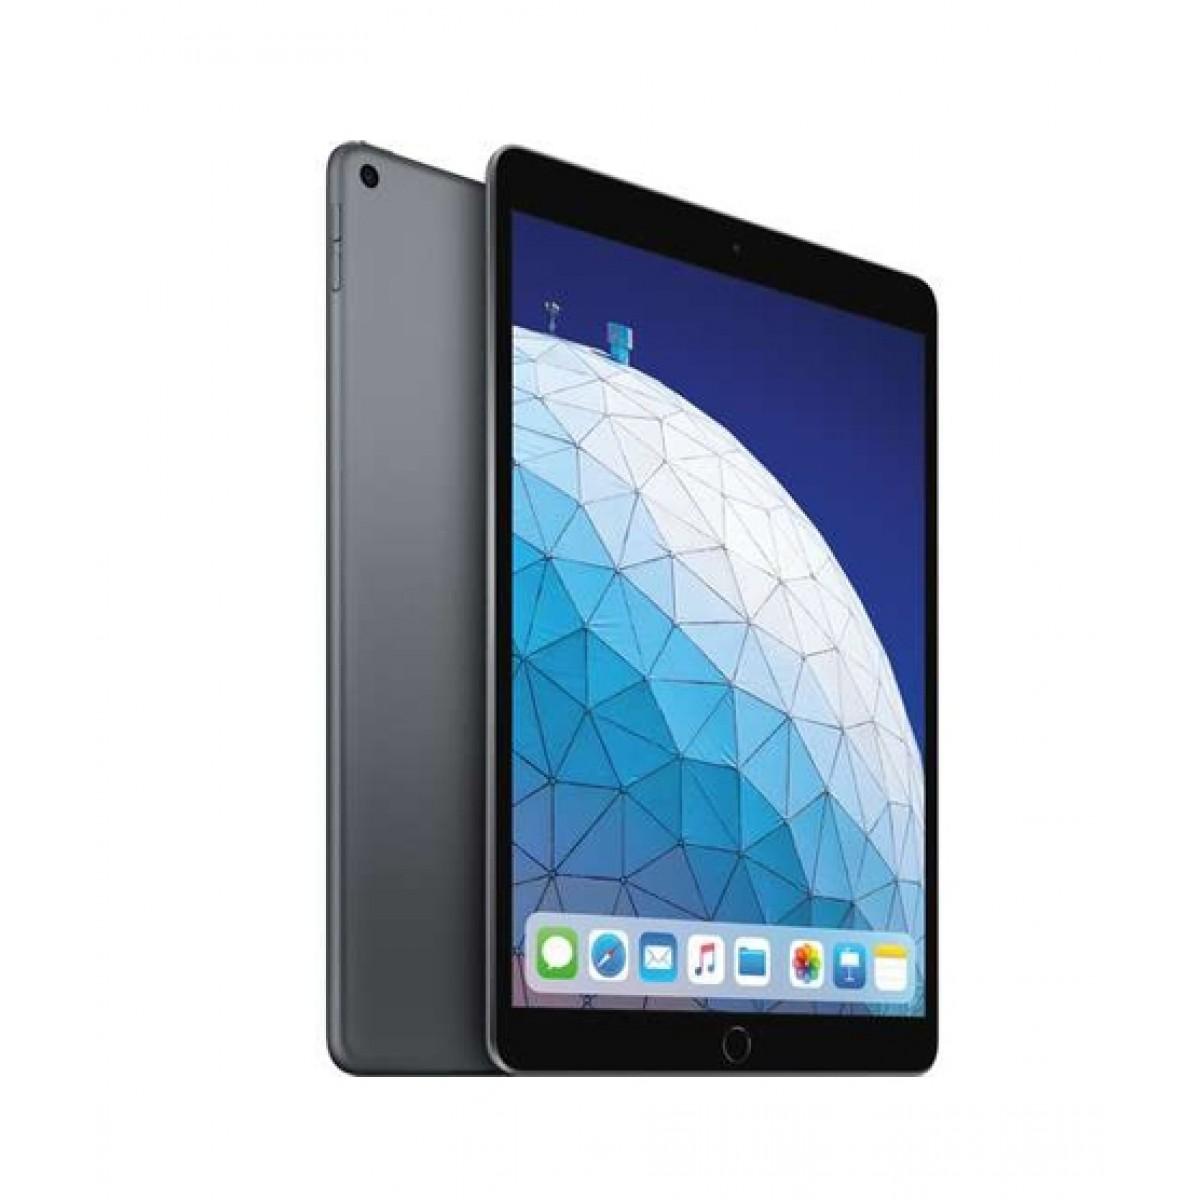 "Apple iPad Air (2019) 10.5"" 64GB WiFi Space Gray"